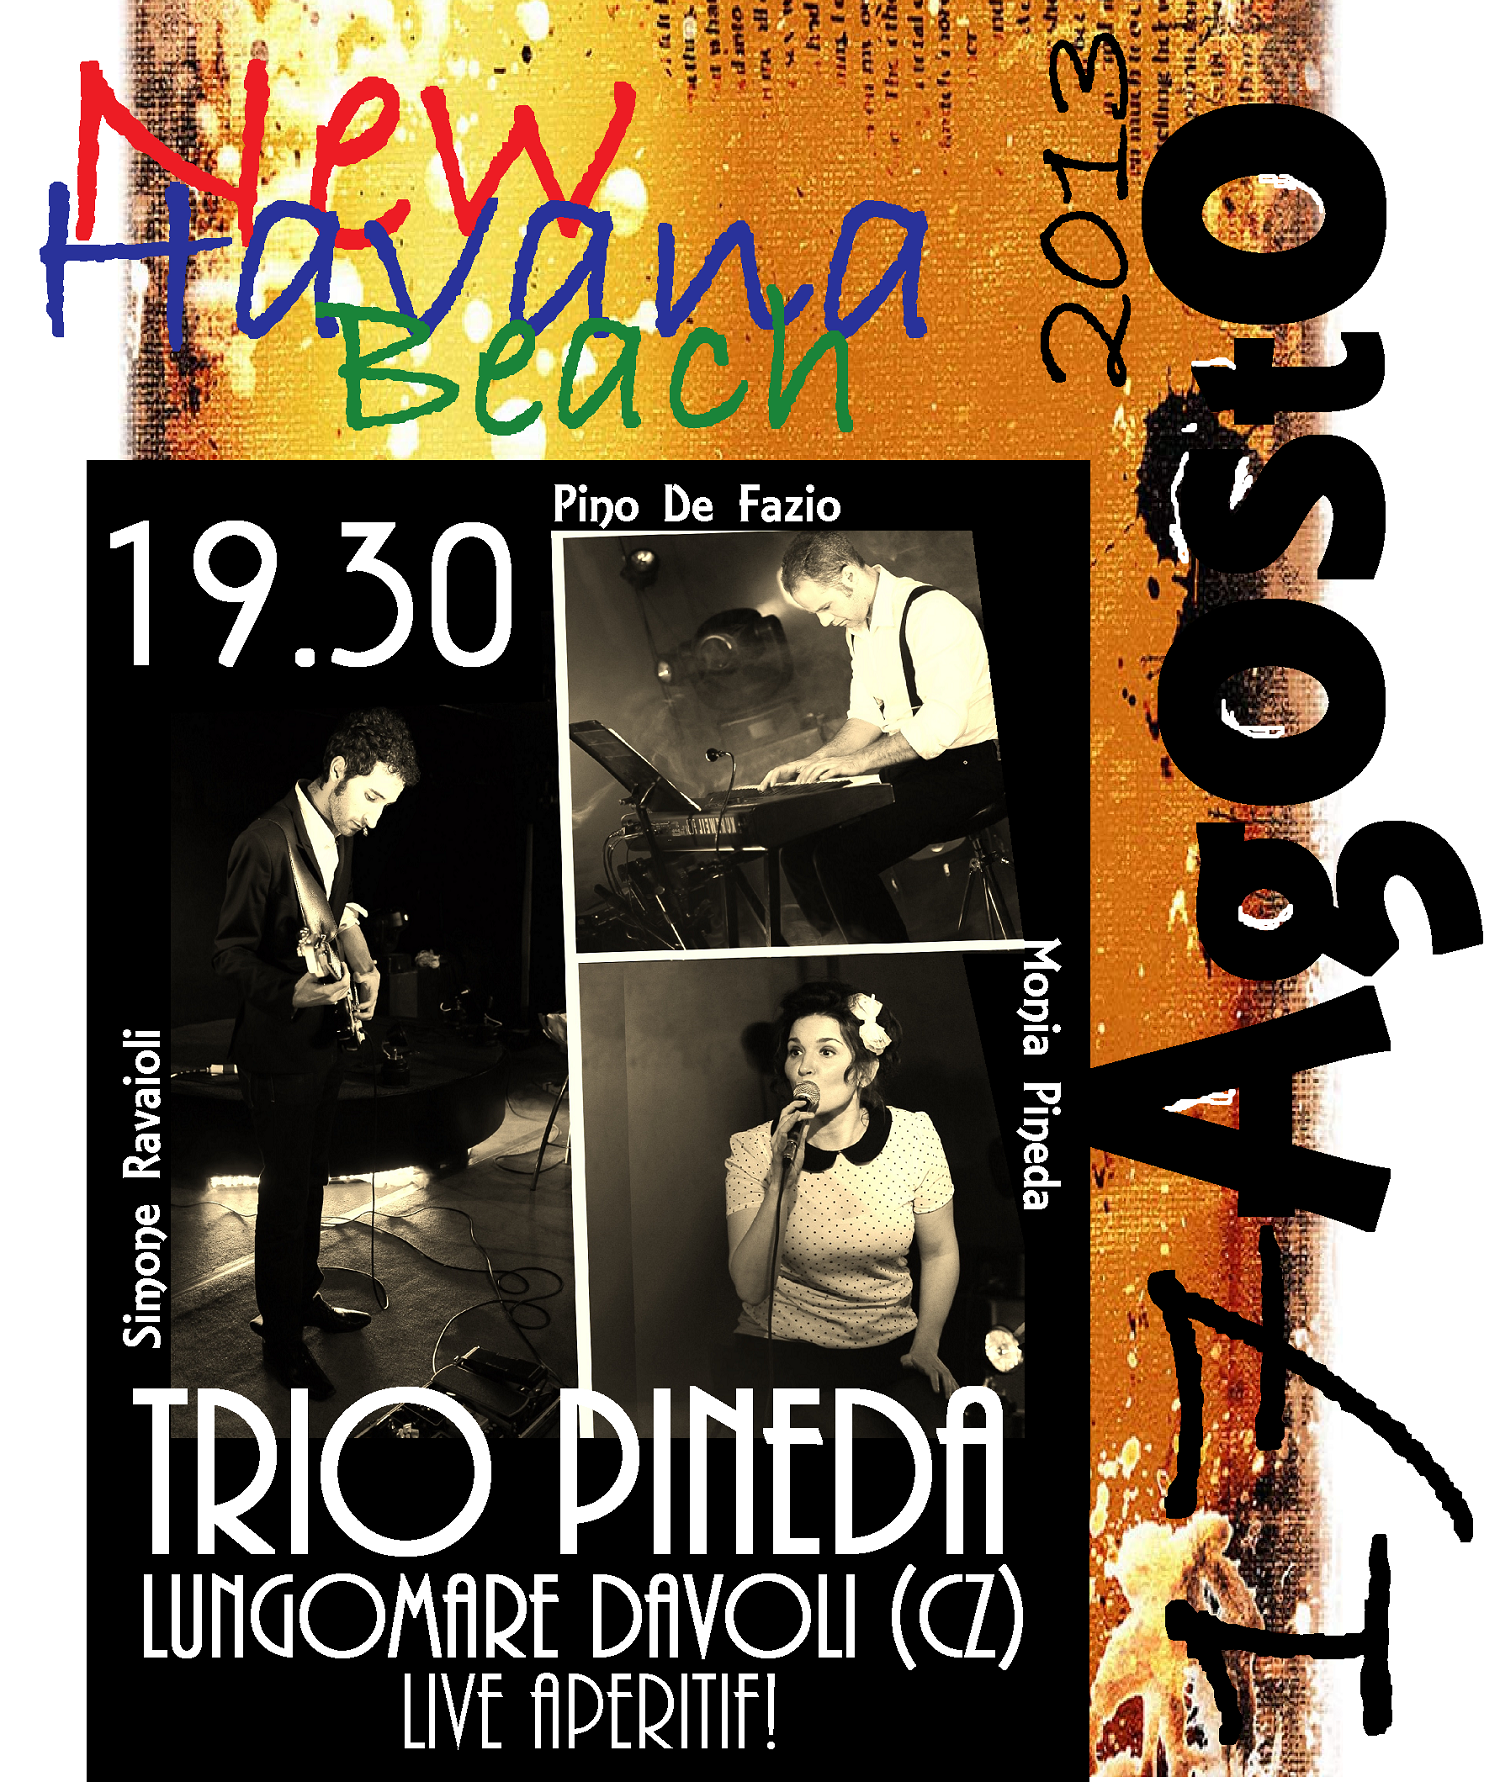 Mini Tour Calabria 2013 - New Havana Beach - Davoli (CZ)